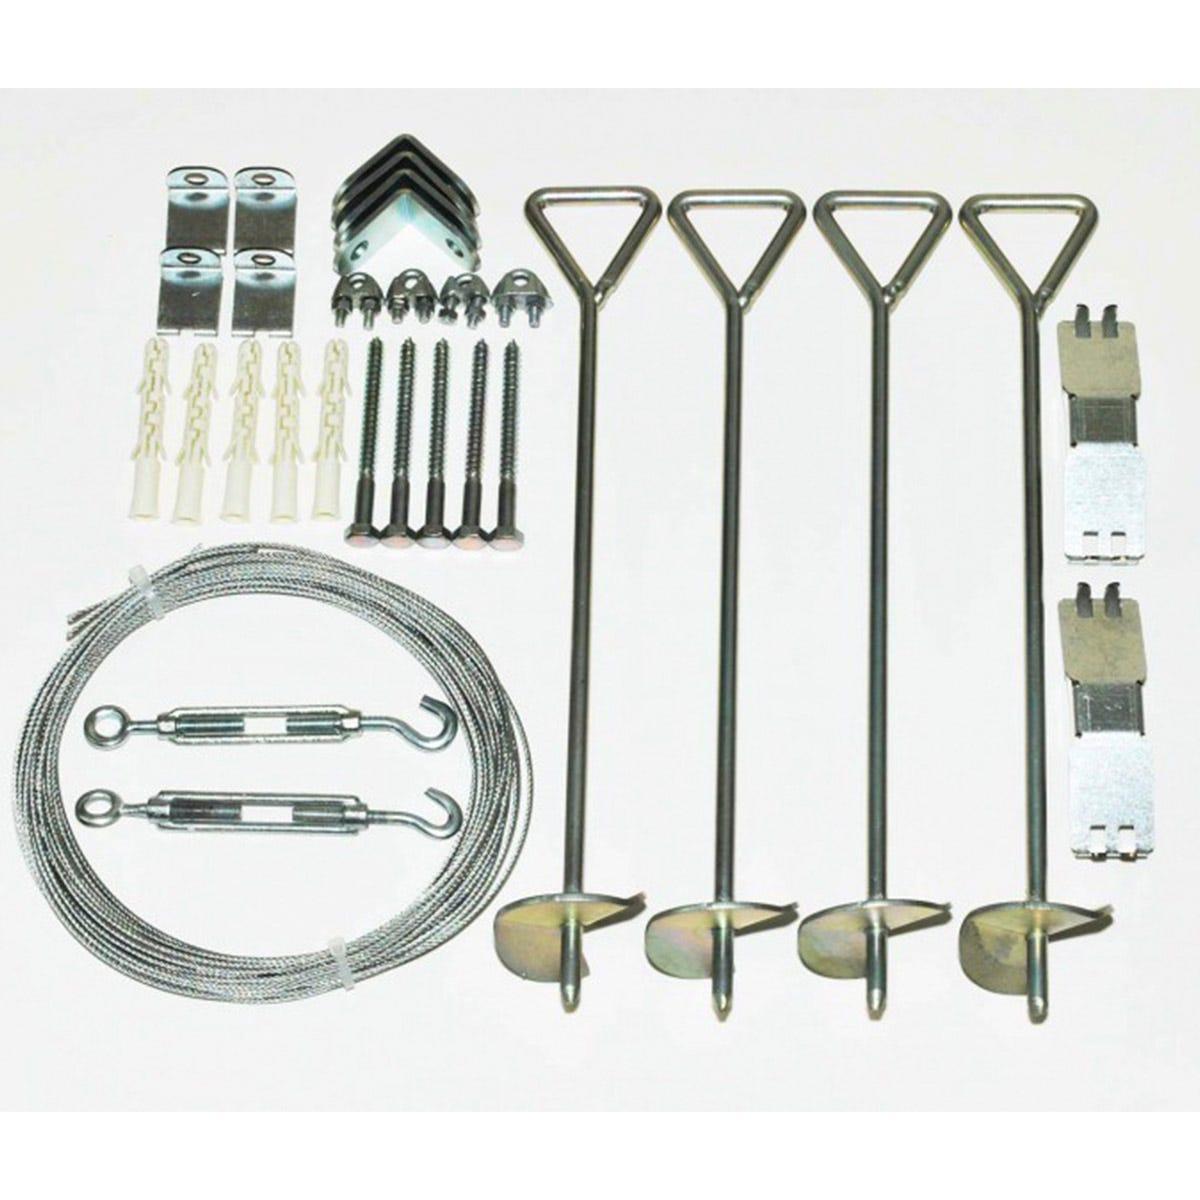 Palram - Canopia Greenhouse Anchoring Kit